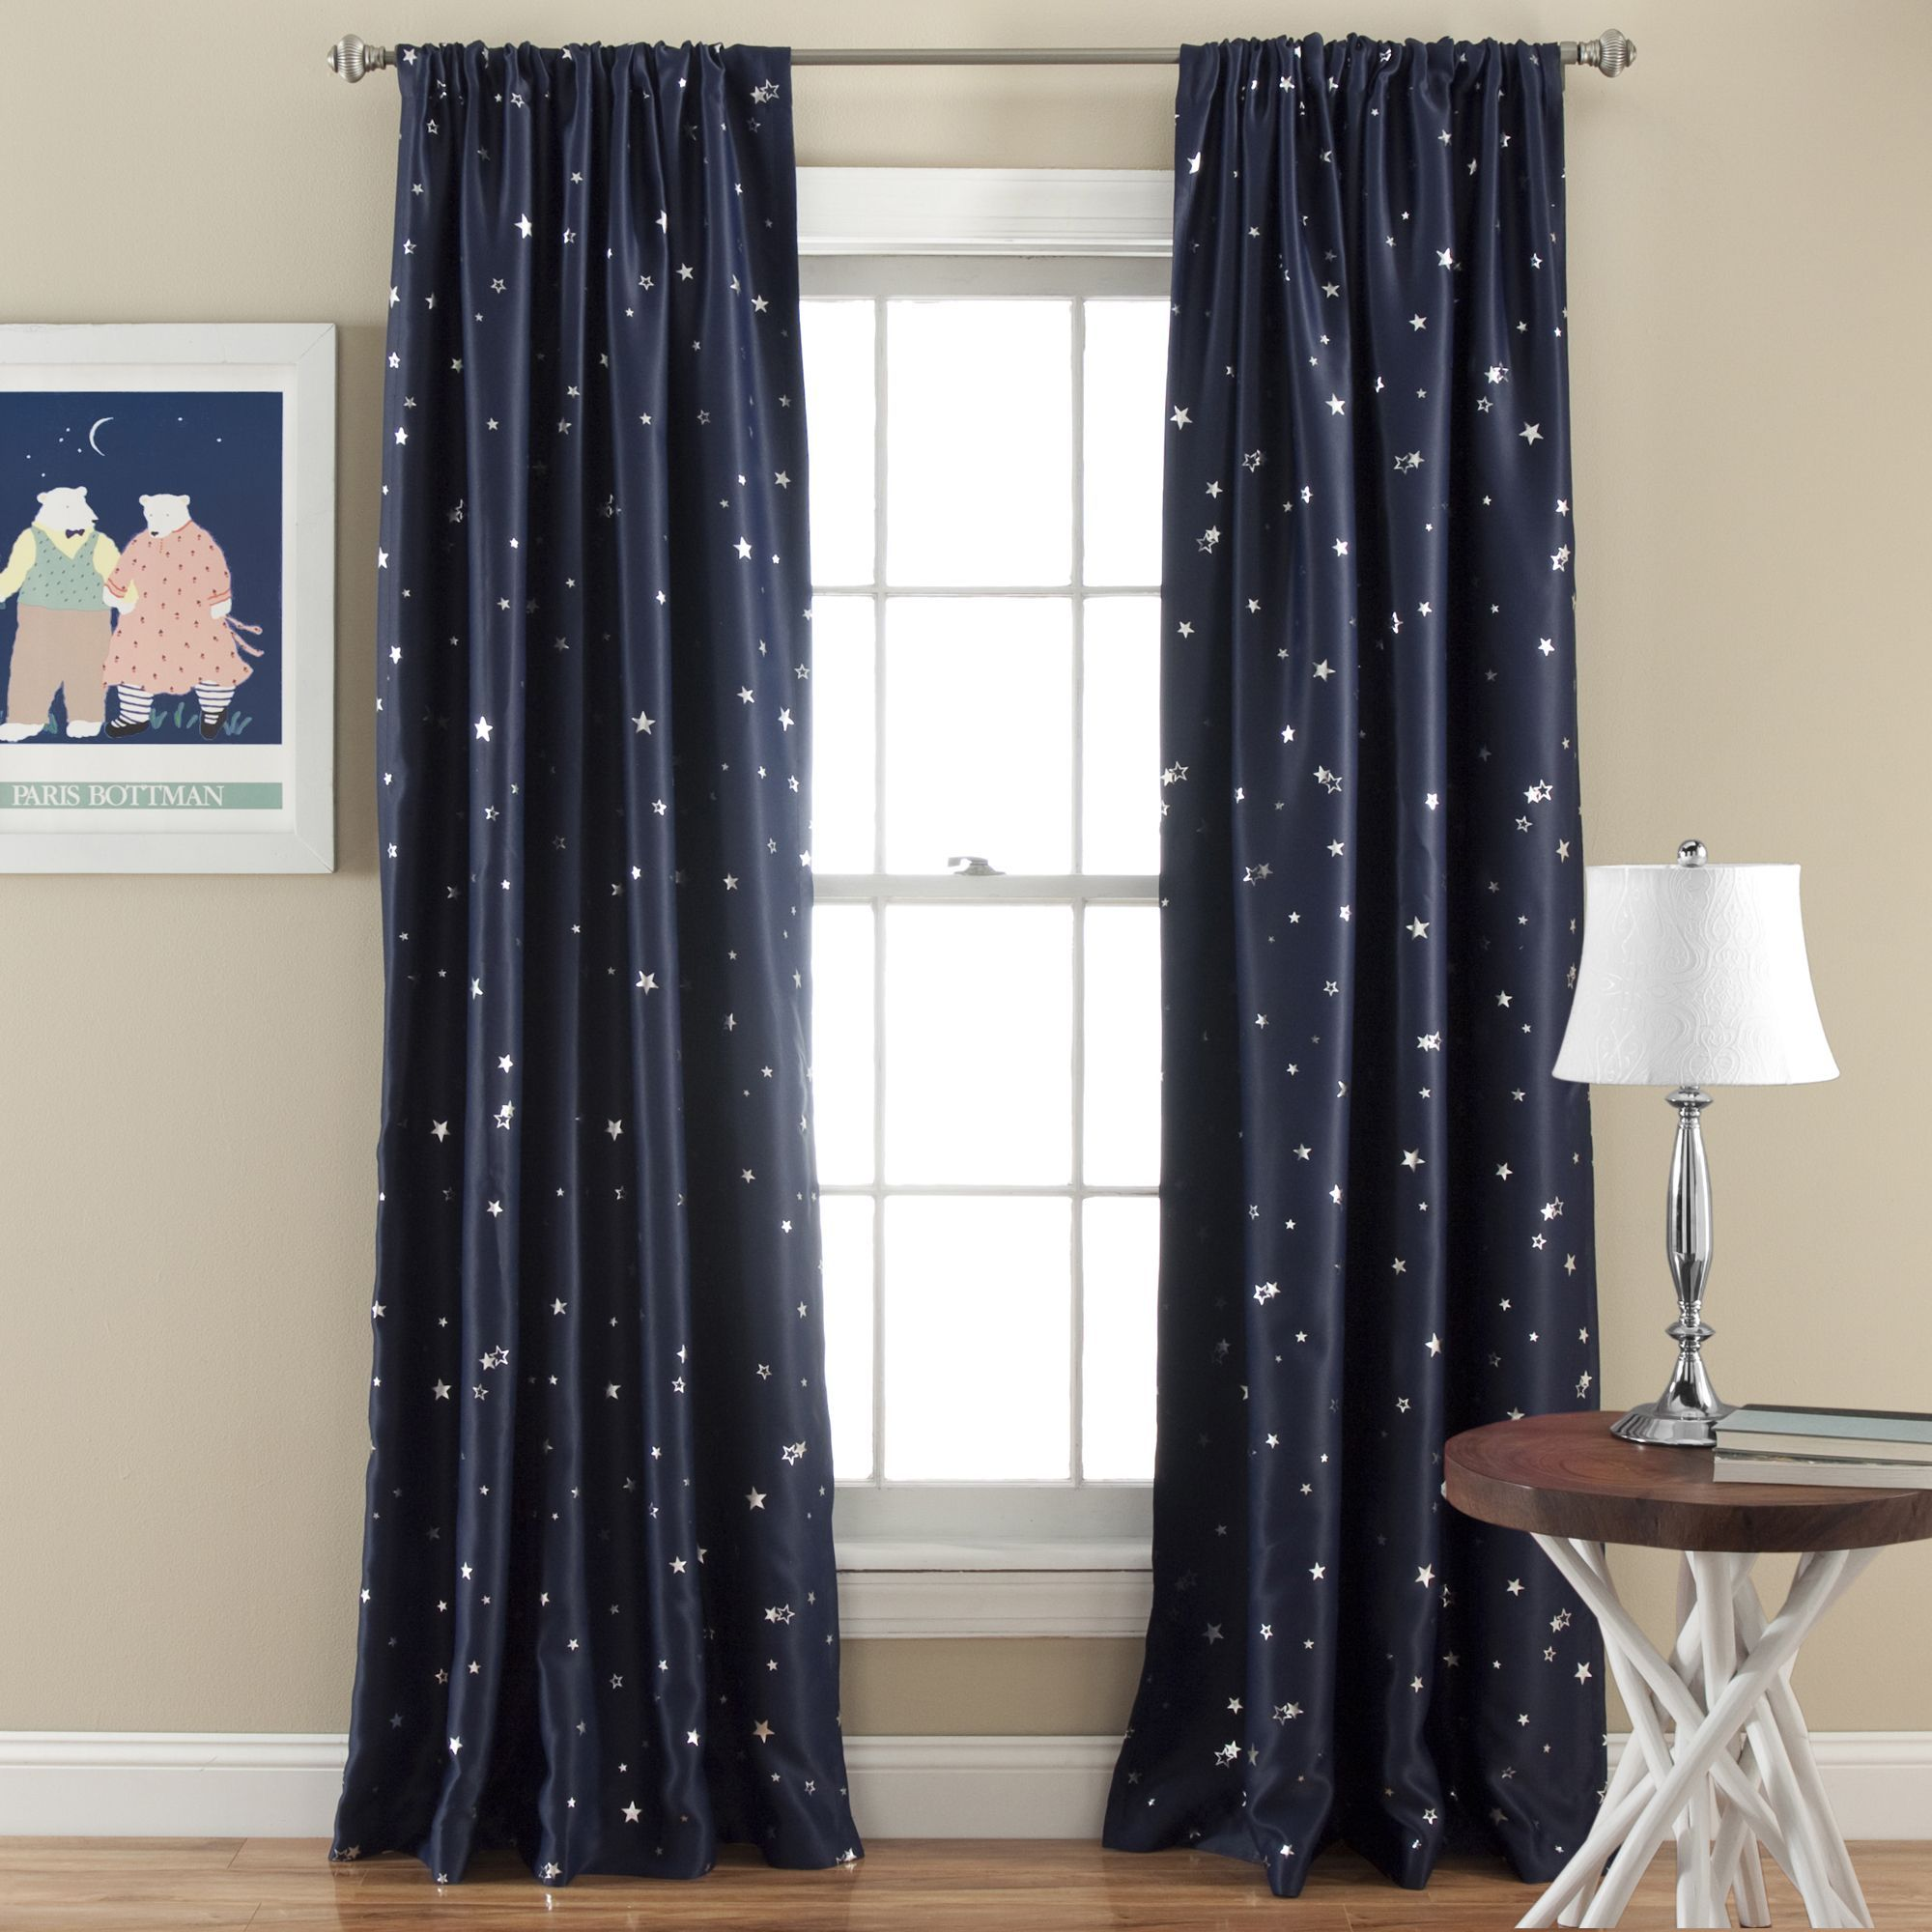 Lush Decor Star Room Darkening Window 84 Inch Curtain Panel Pair